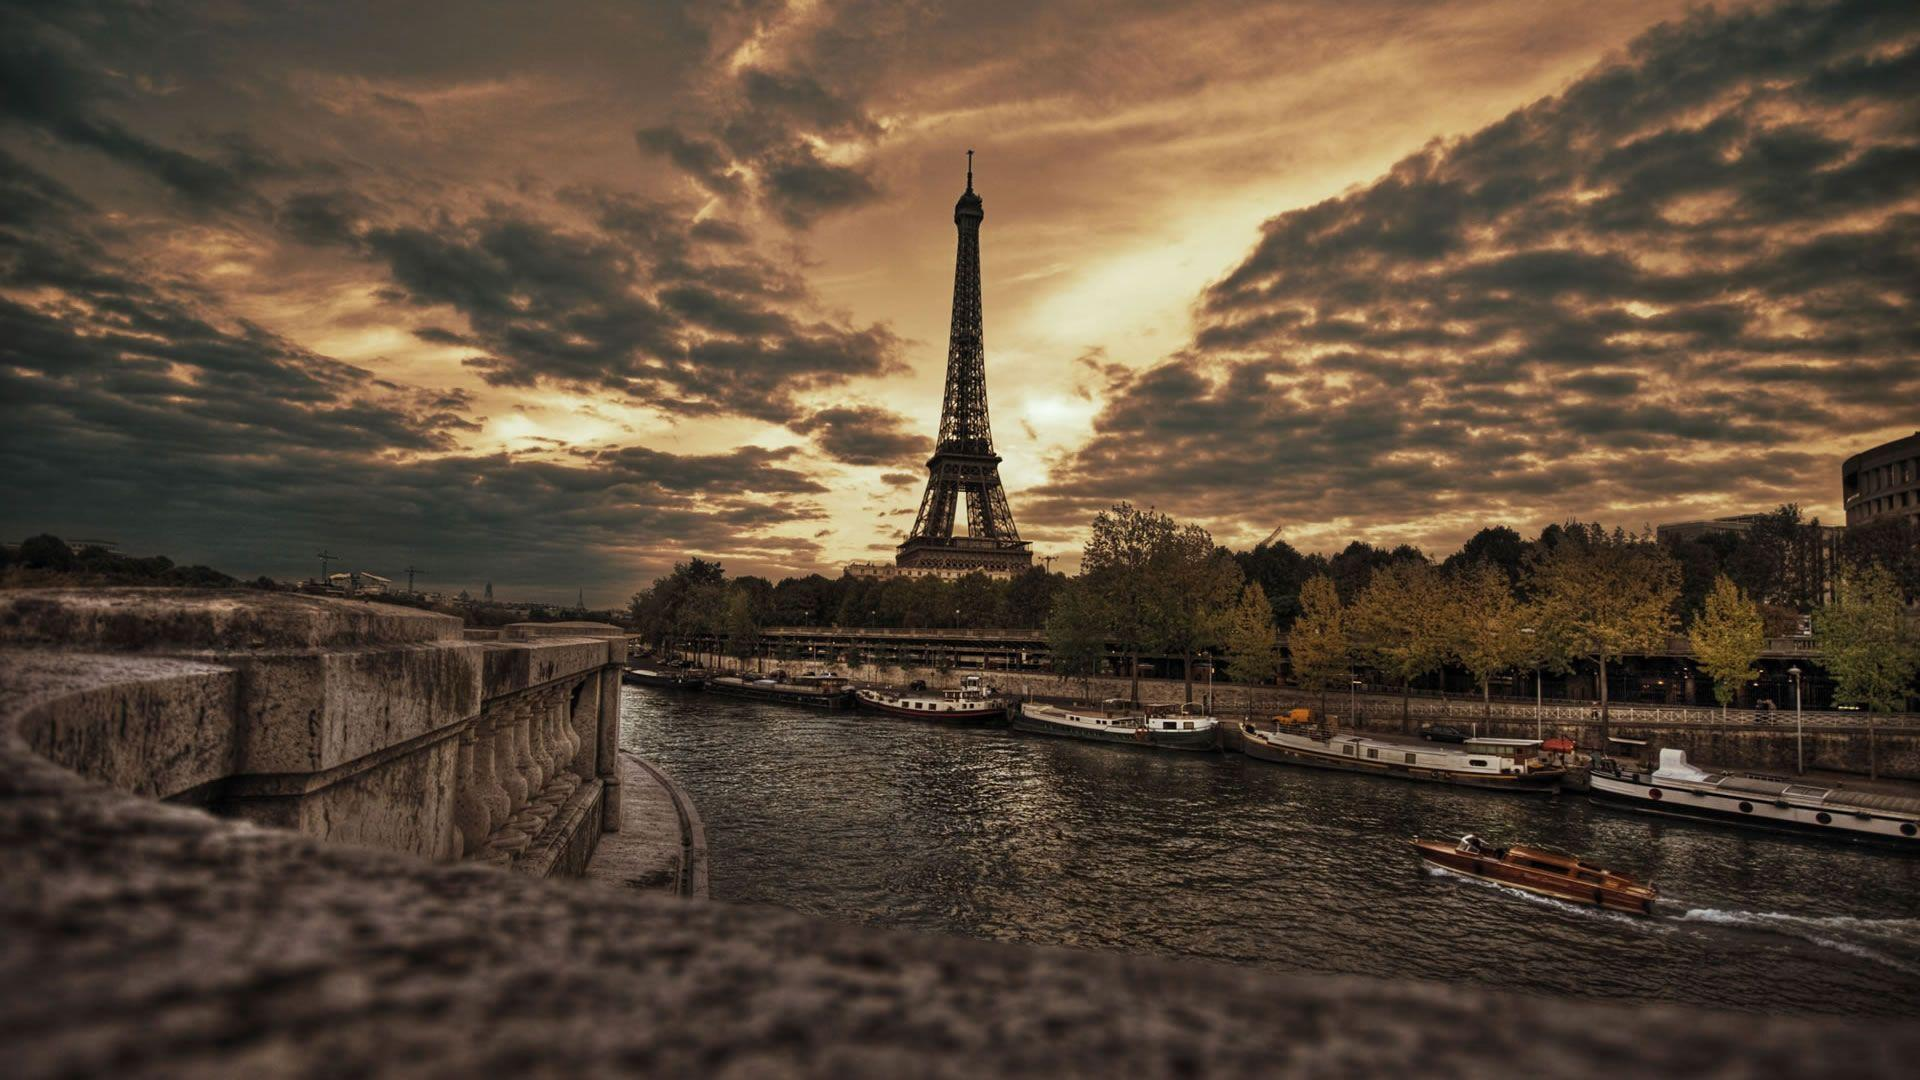 Paris HD Wallpapers - HD Wallpapers Inn